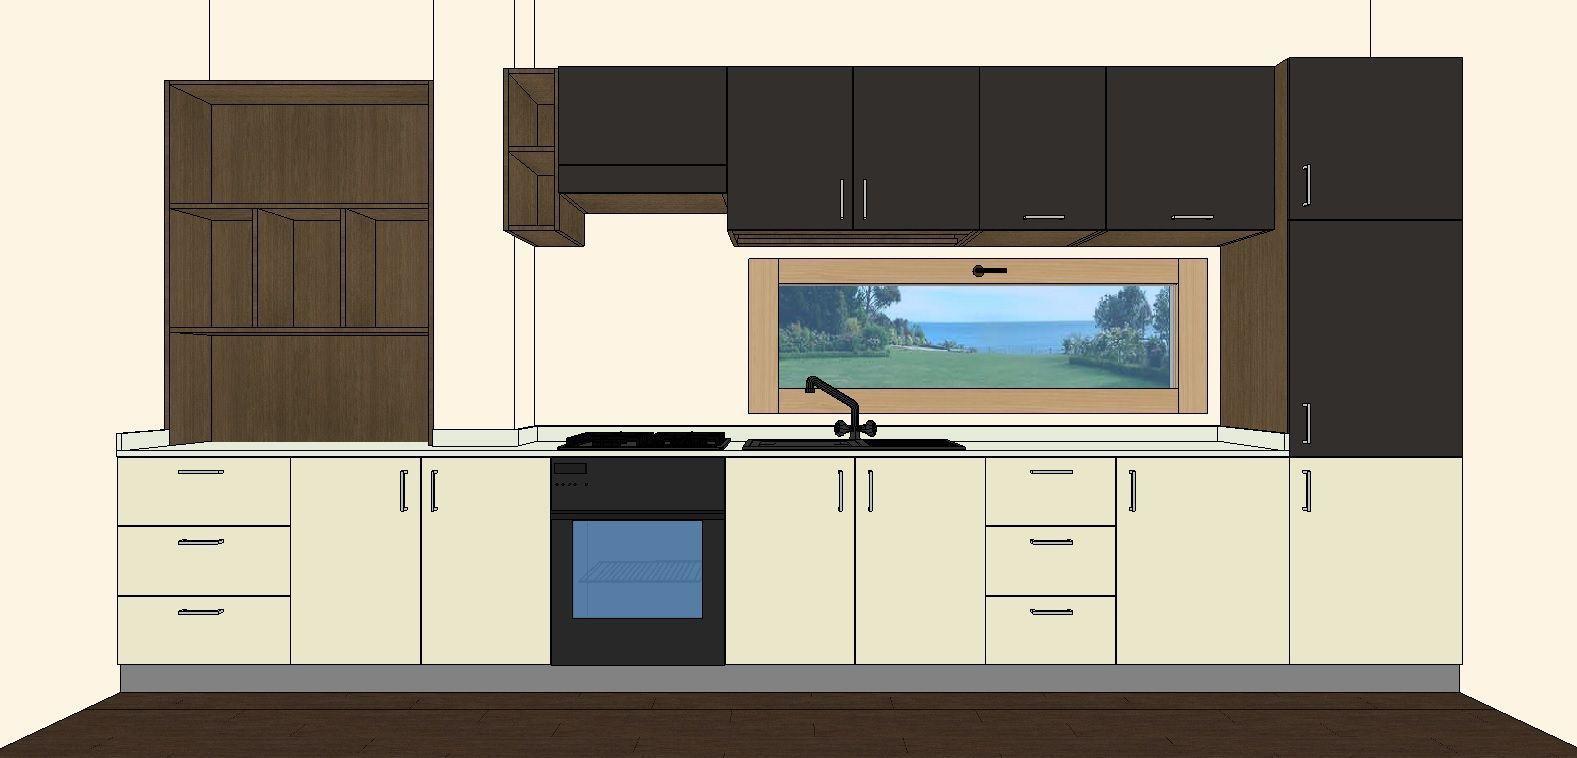 Ordinaire ... Furniture Design Software / CAD / For Concrete Structures ...